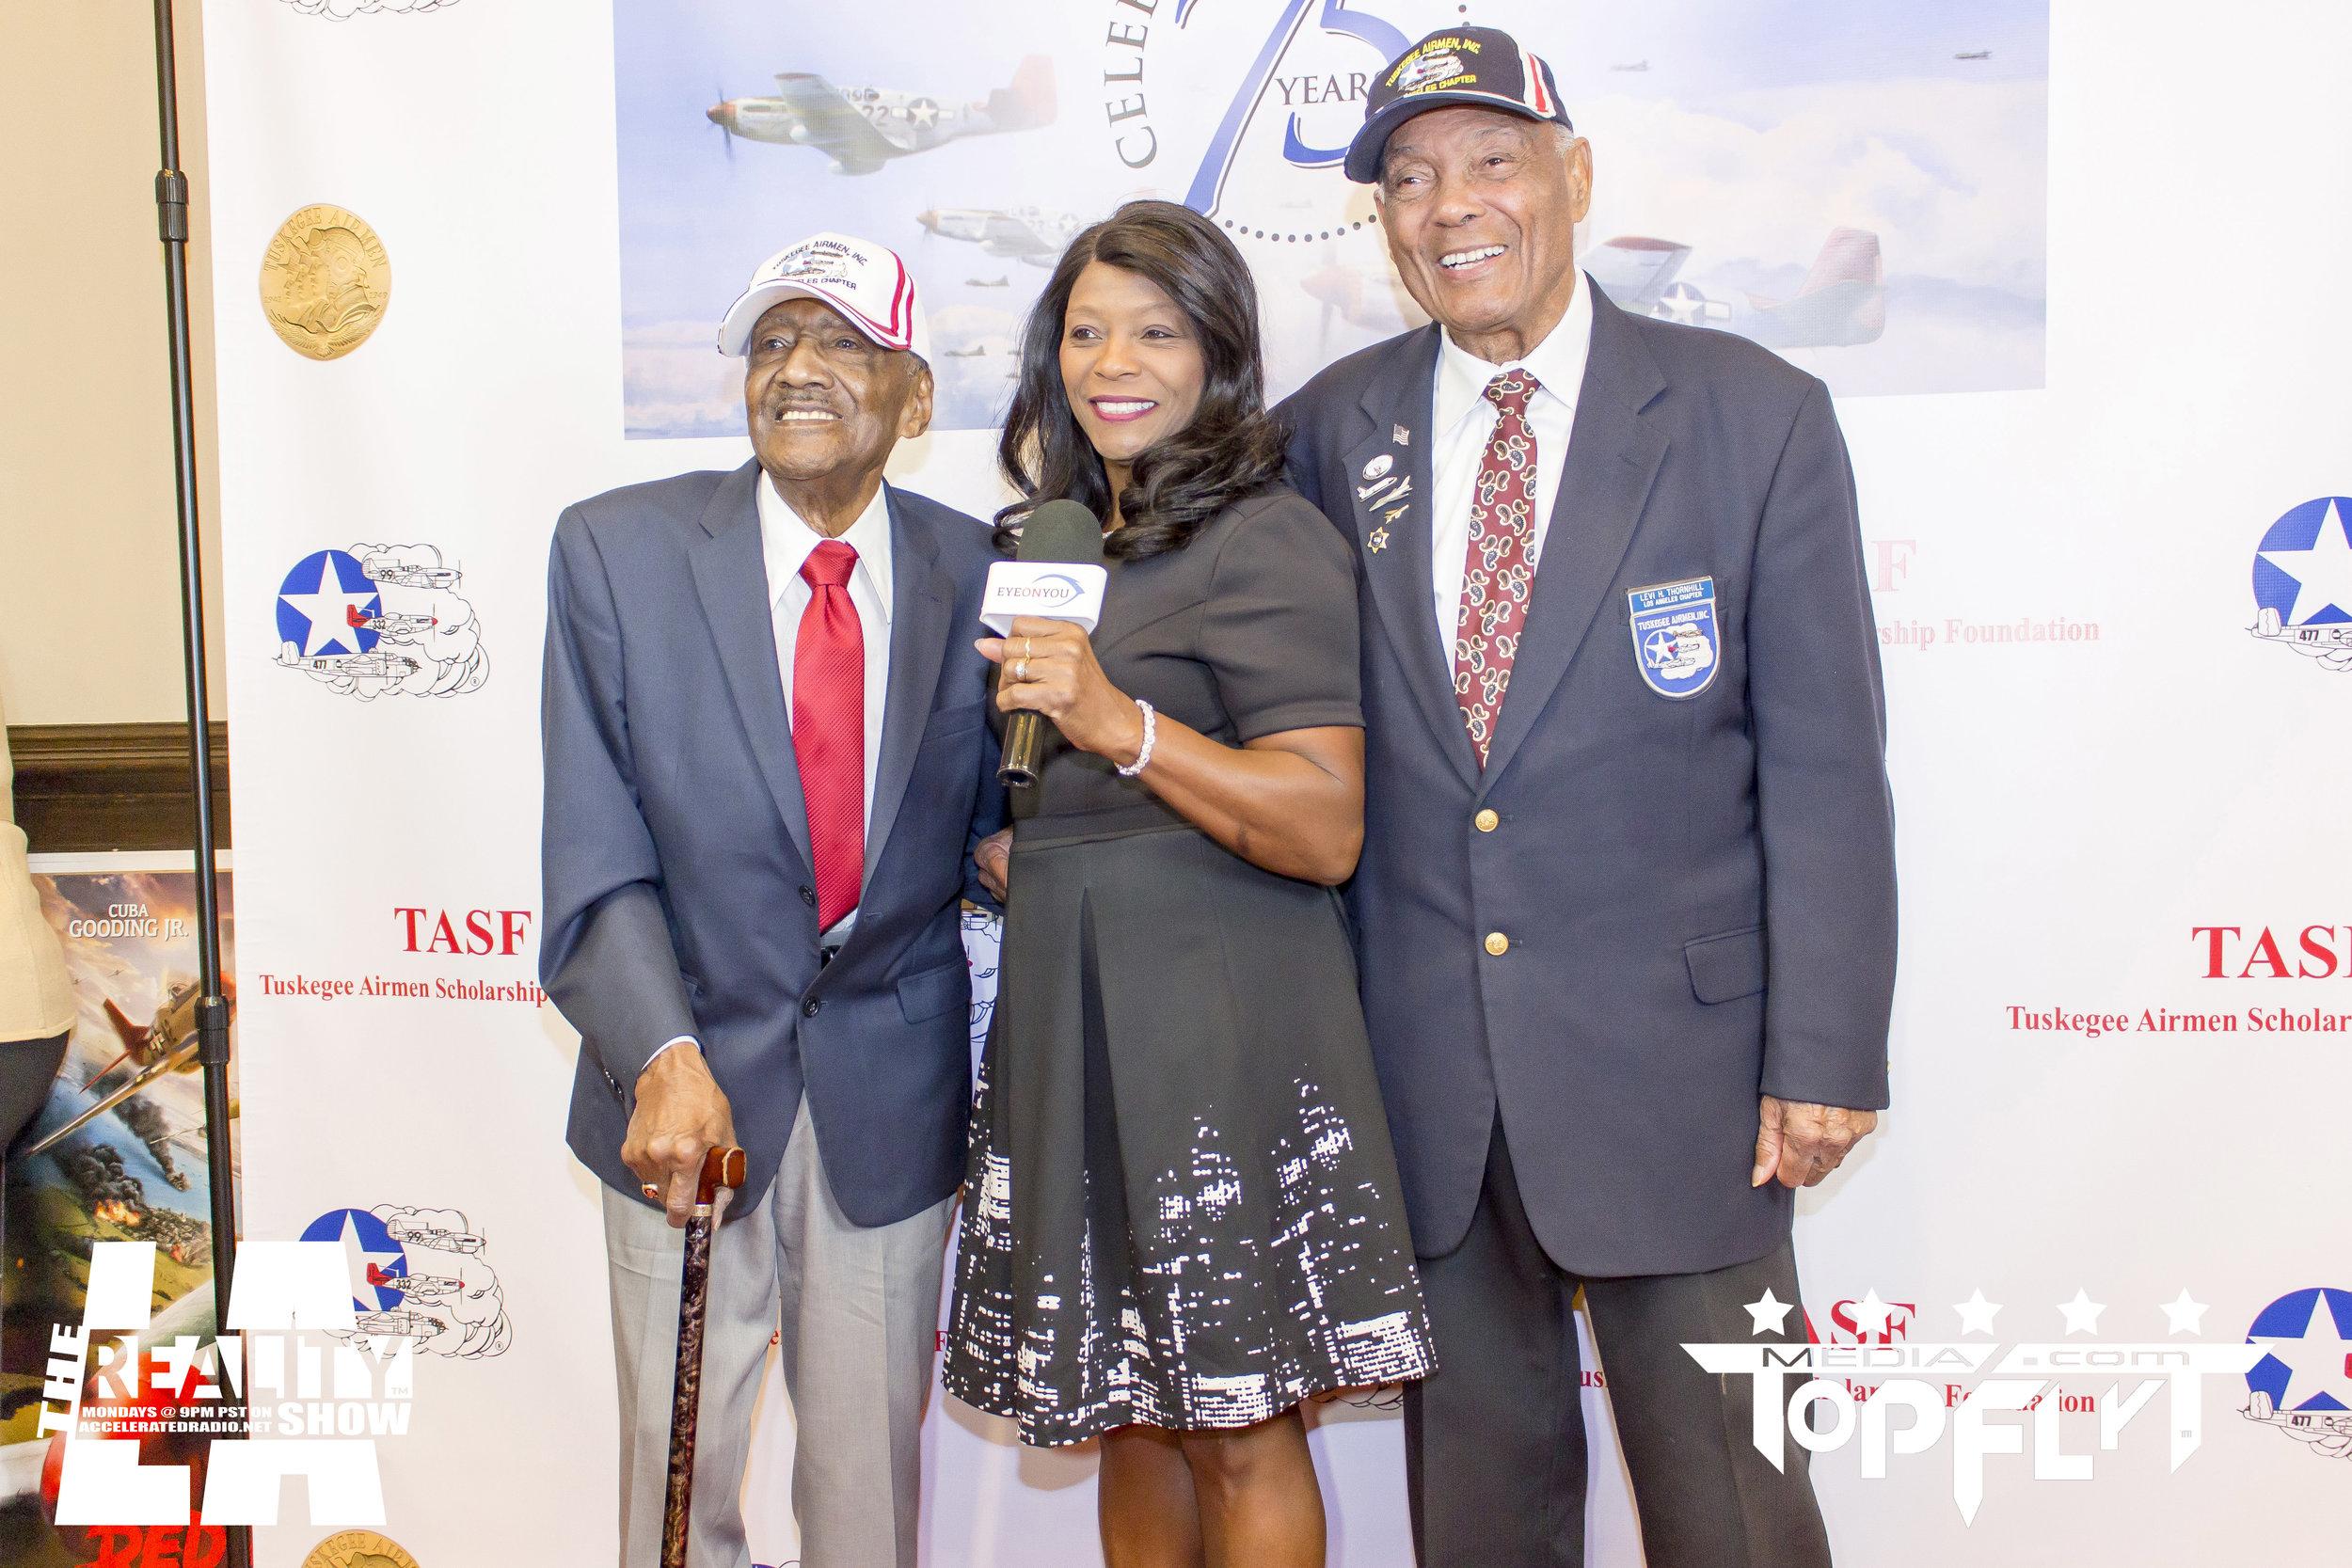 The Reality Show LA - Tuskegee Airmen 75th Anniversary VIP Reception_30.jpg